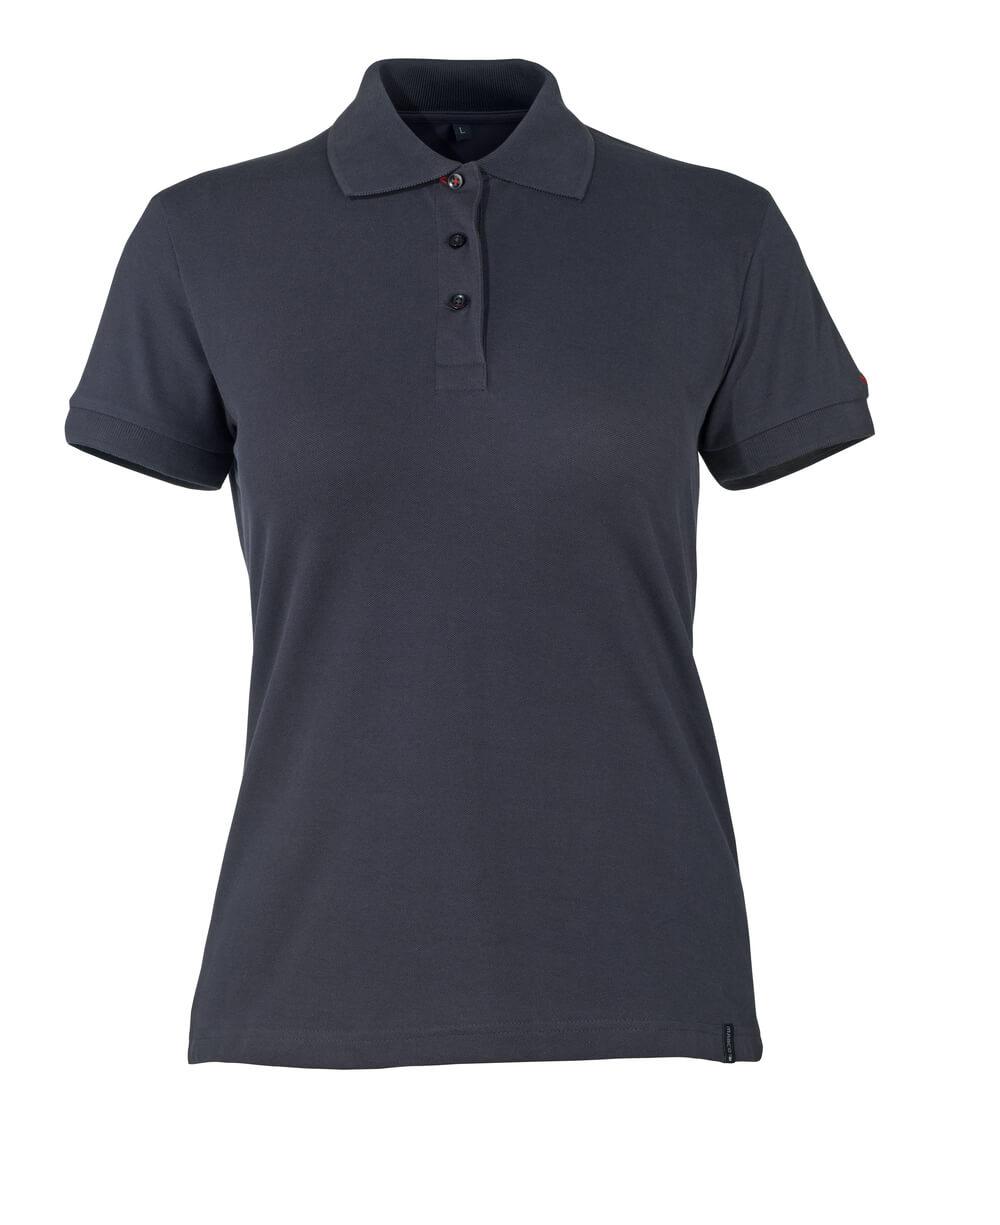 50363-861-010 Polo-Shirt - Schwarzblau